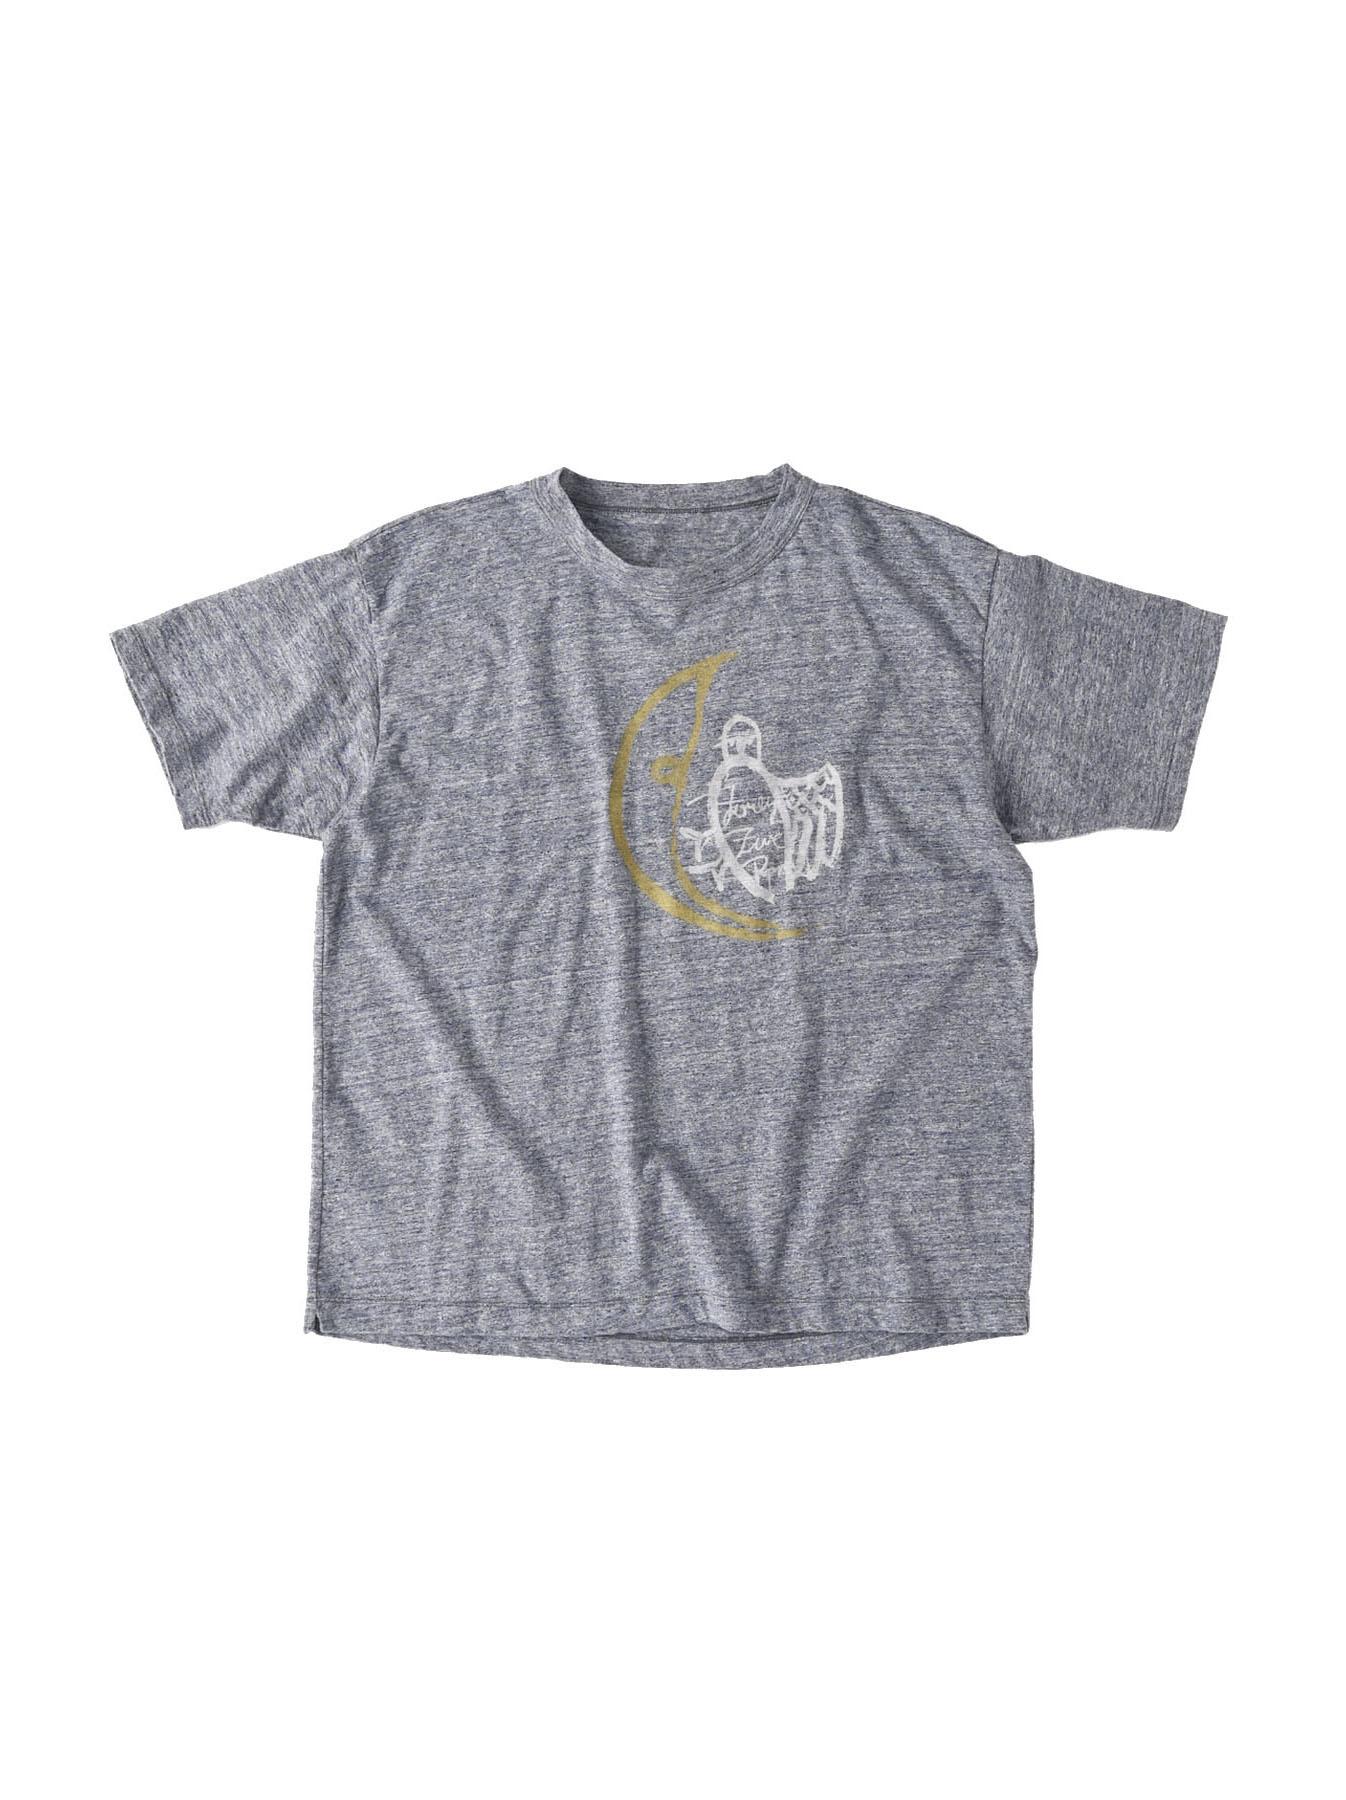 Top Sumite de Owl T-shirt-1